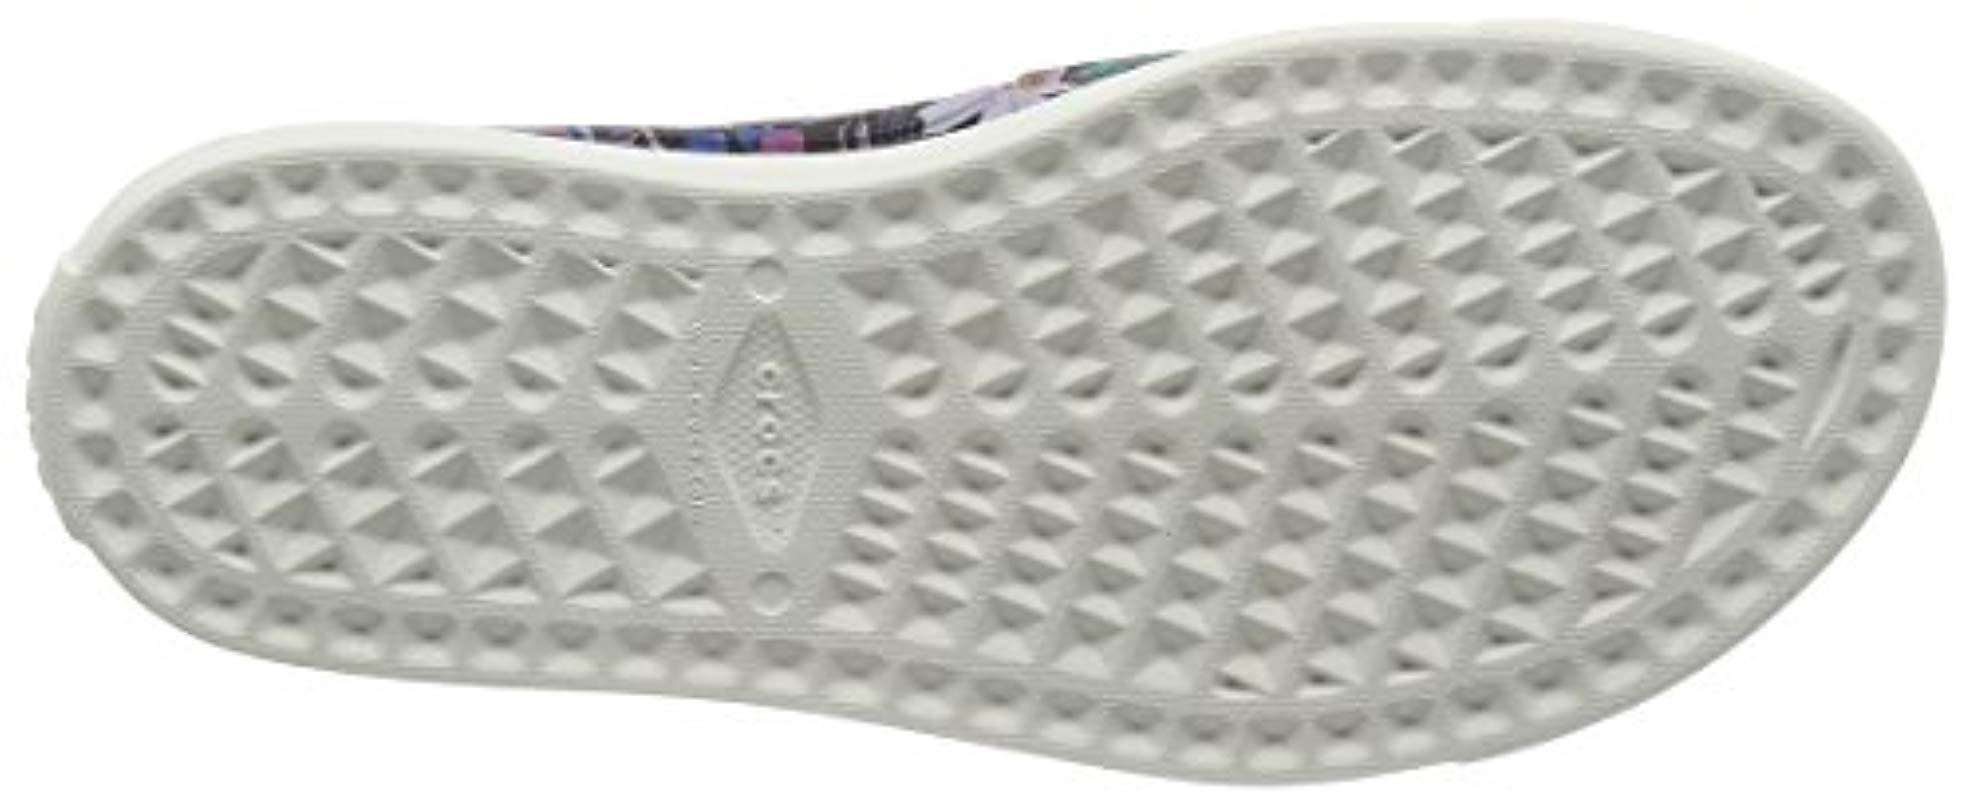 86fe31b8da69d Crocs™ - Multicolor S Citilane Roka Graphic Slip-on Low-top Sneakers -.  View fullscreen